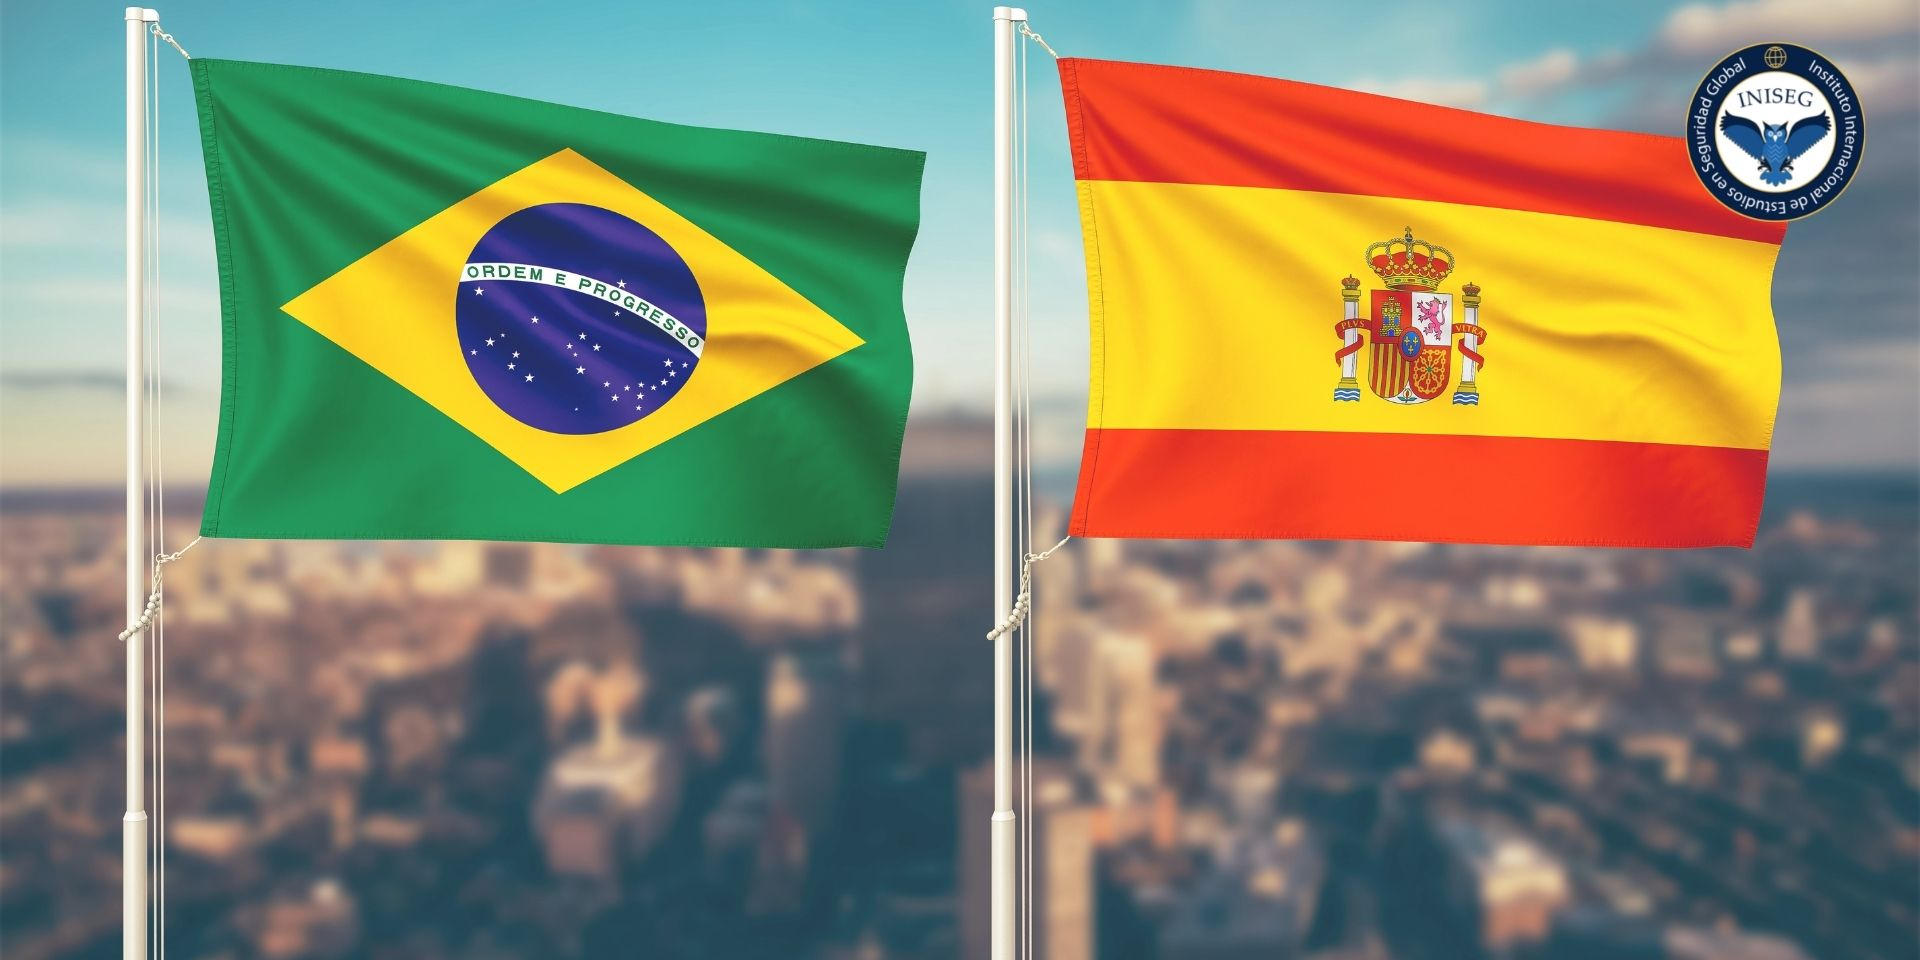 Colaboraciones académicas logradas por INISEG Brasil se destacan en toda su prensa nacional | Iniseg